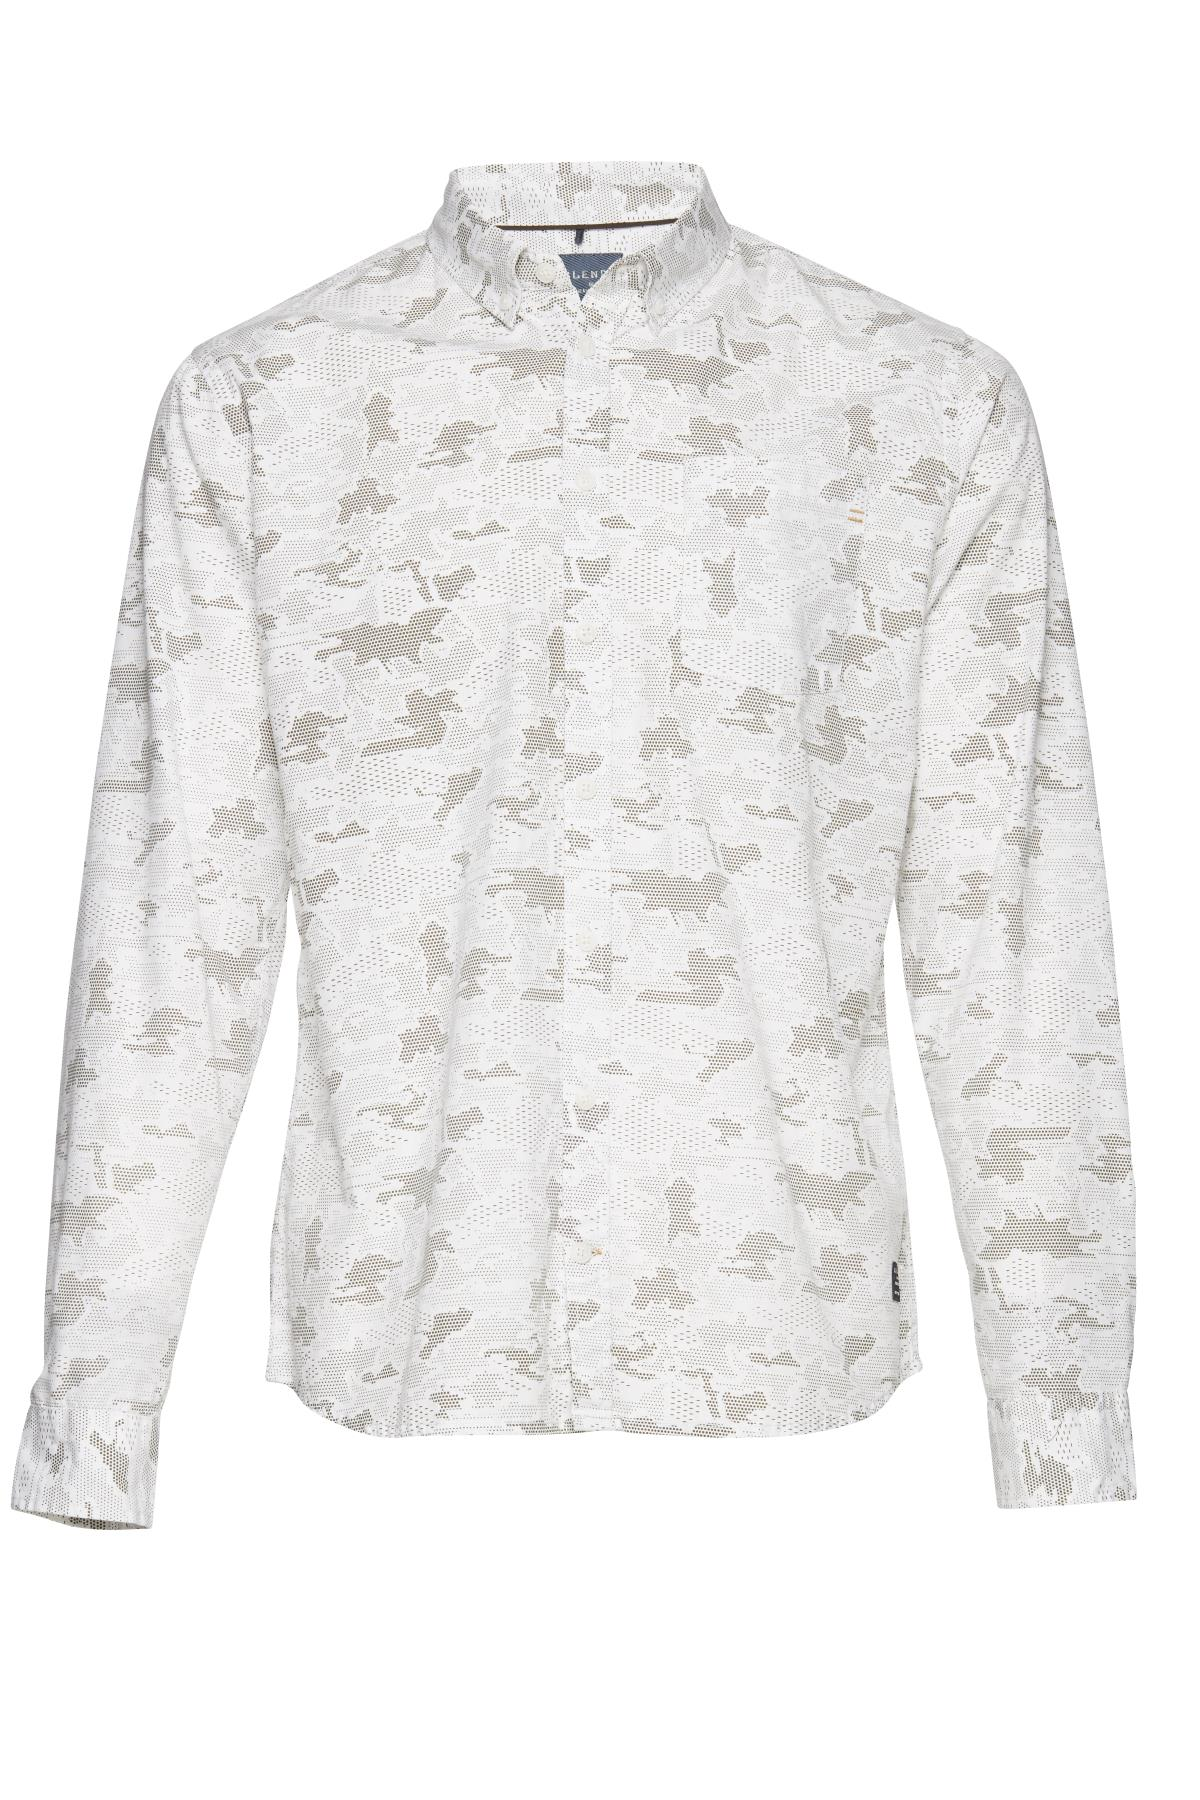 Off-white/khaki